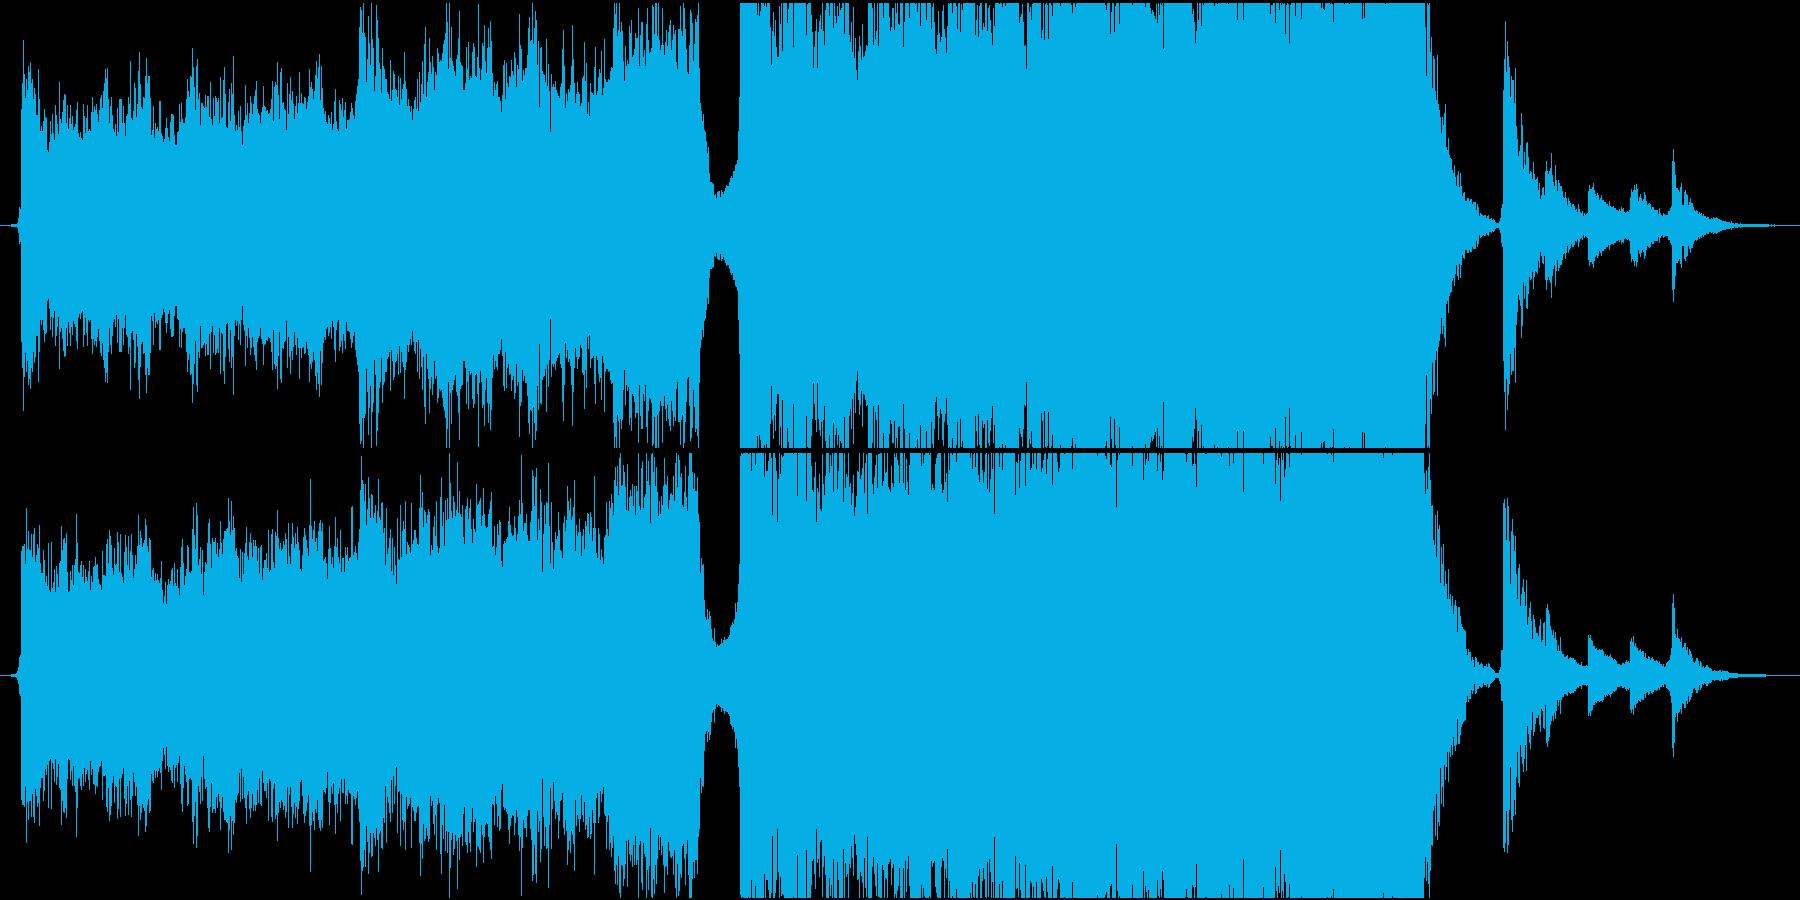 Epic Musicの再生済みの波形